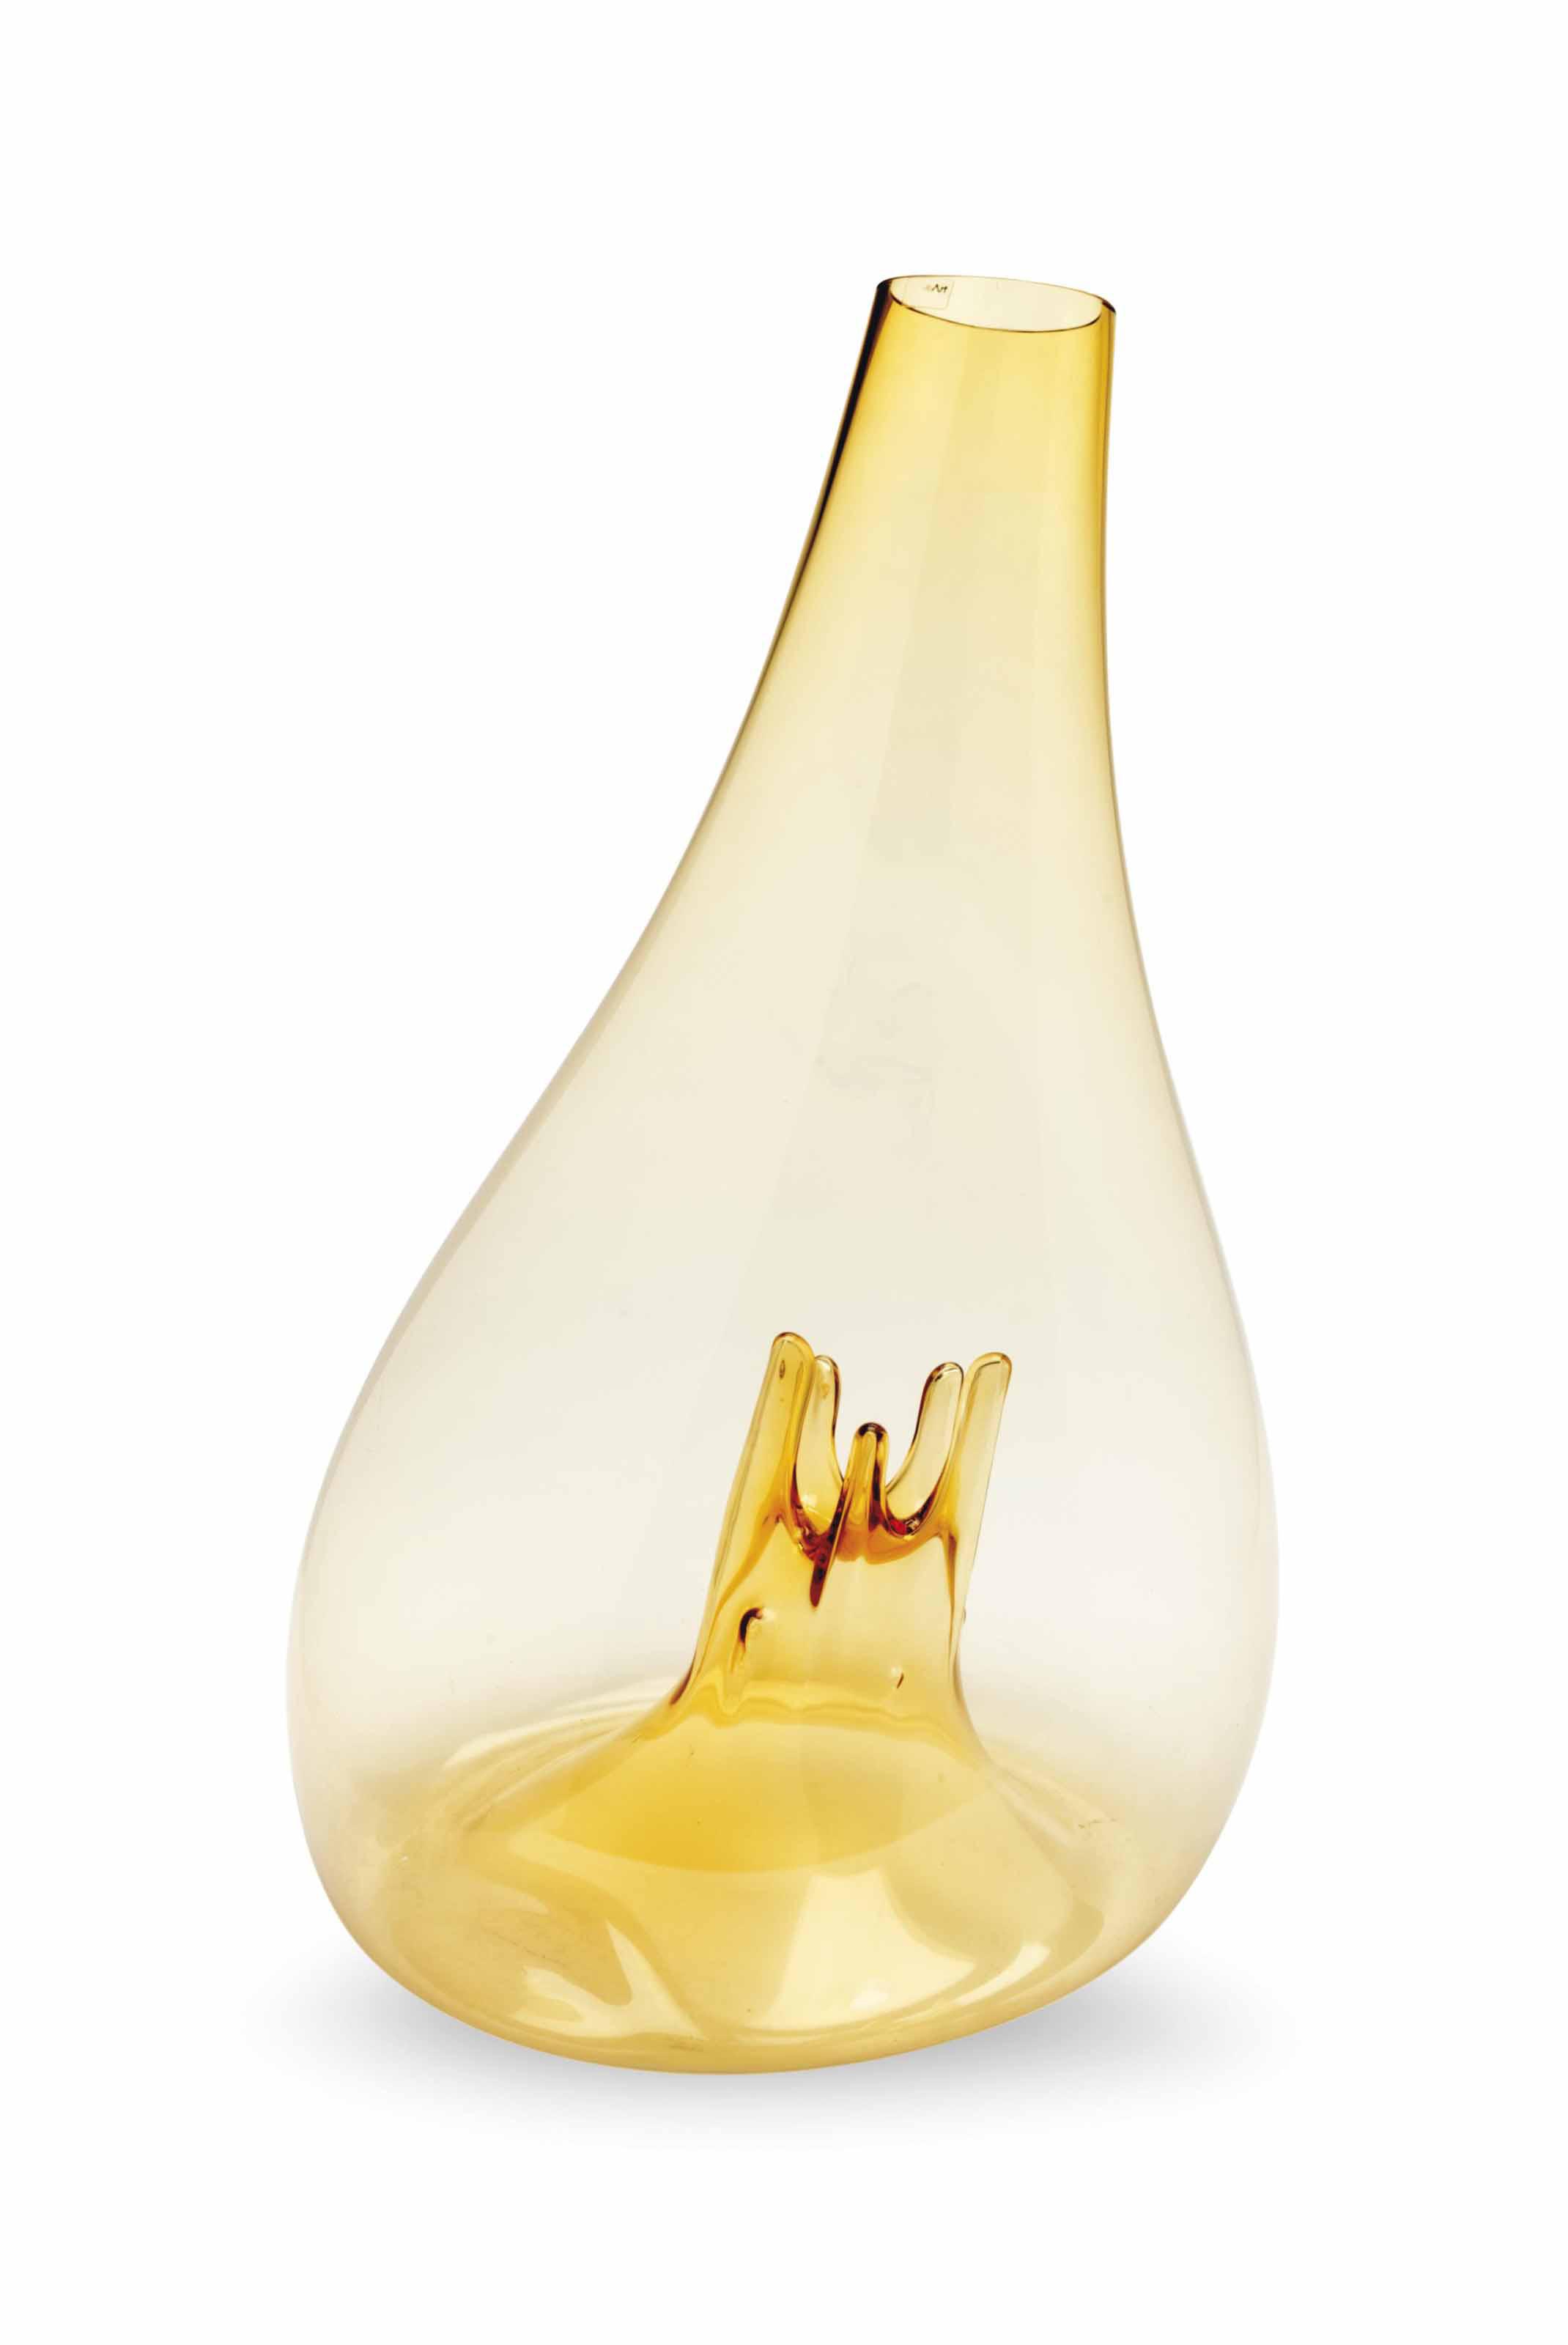 AN ITALIAN MASSIVE BLOWN AMBER GLASS SCULPTURAL VASE, OTRI